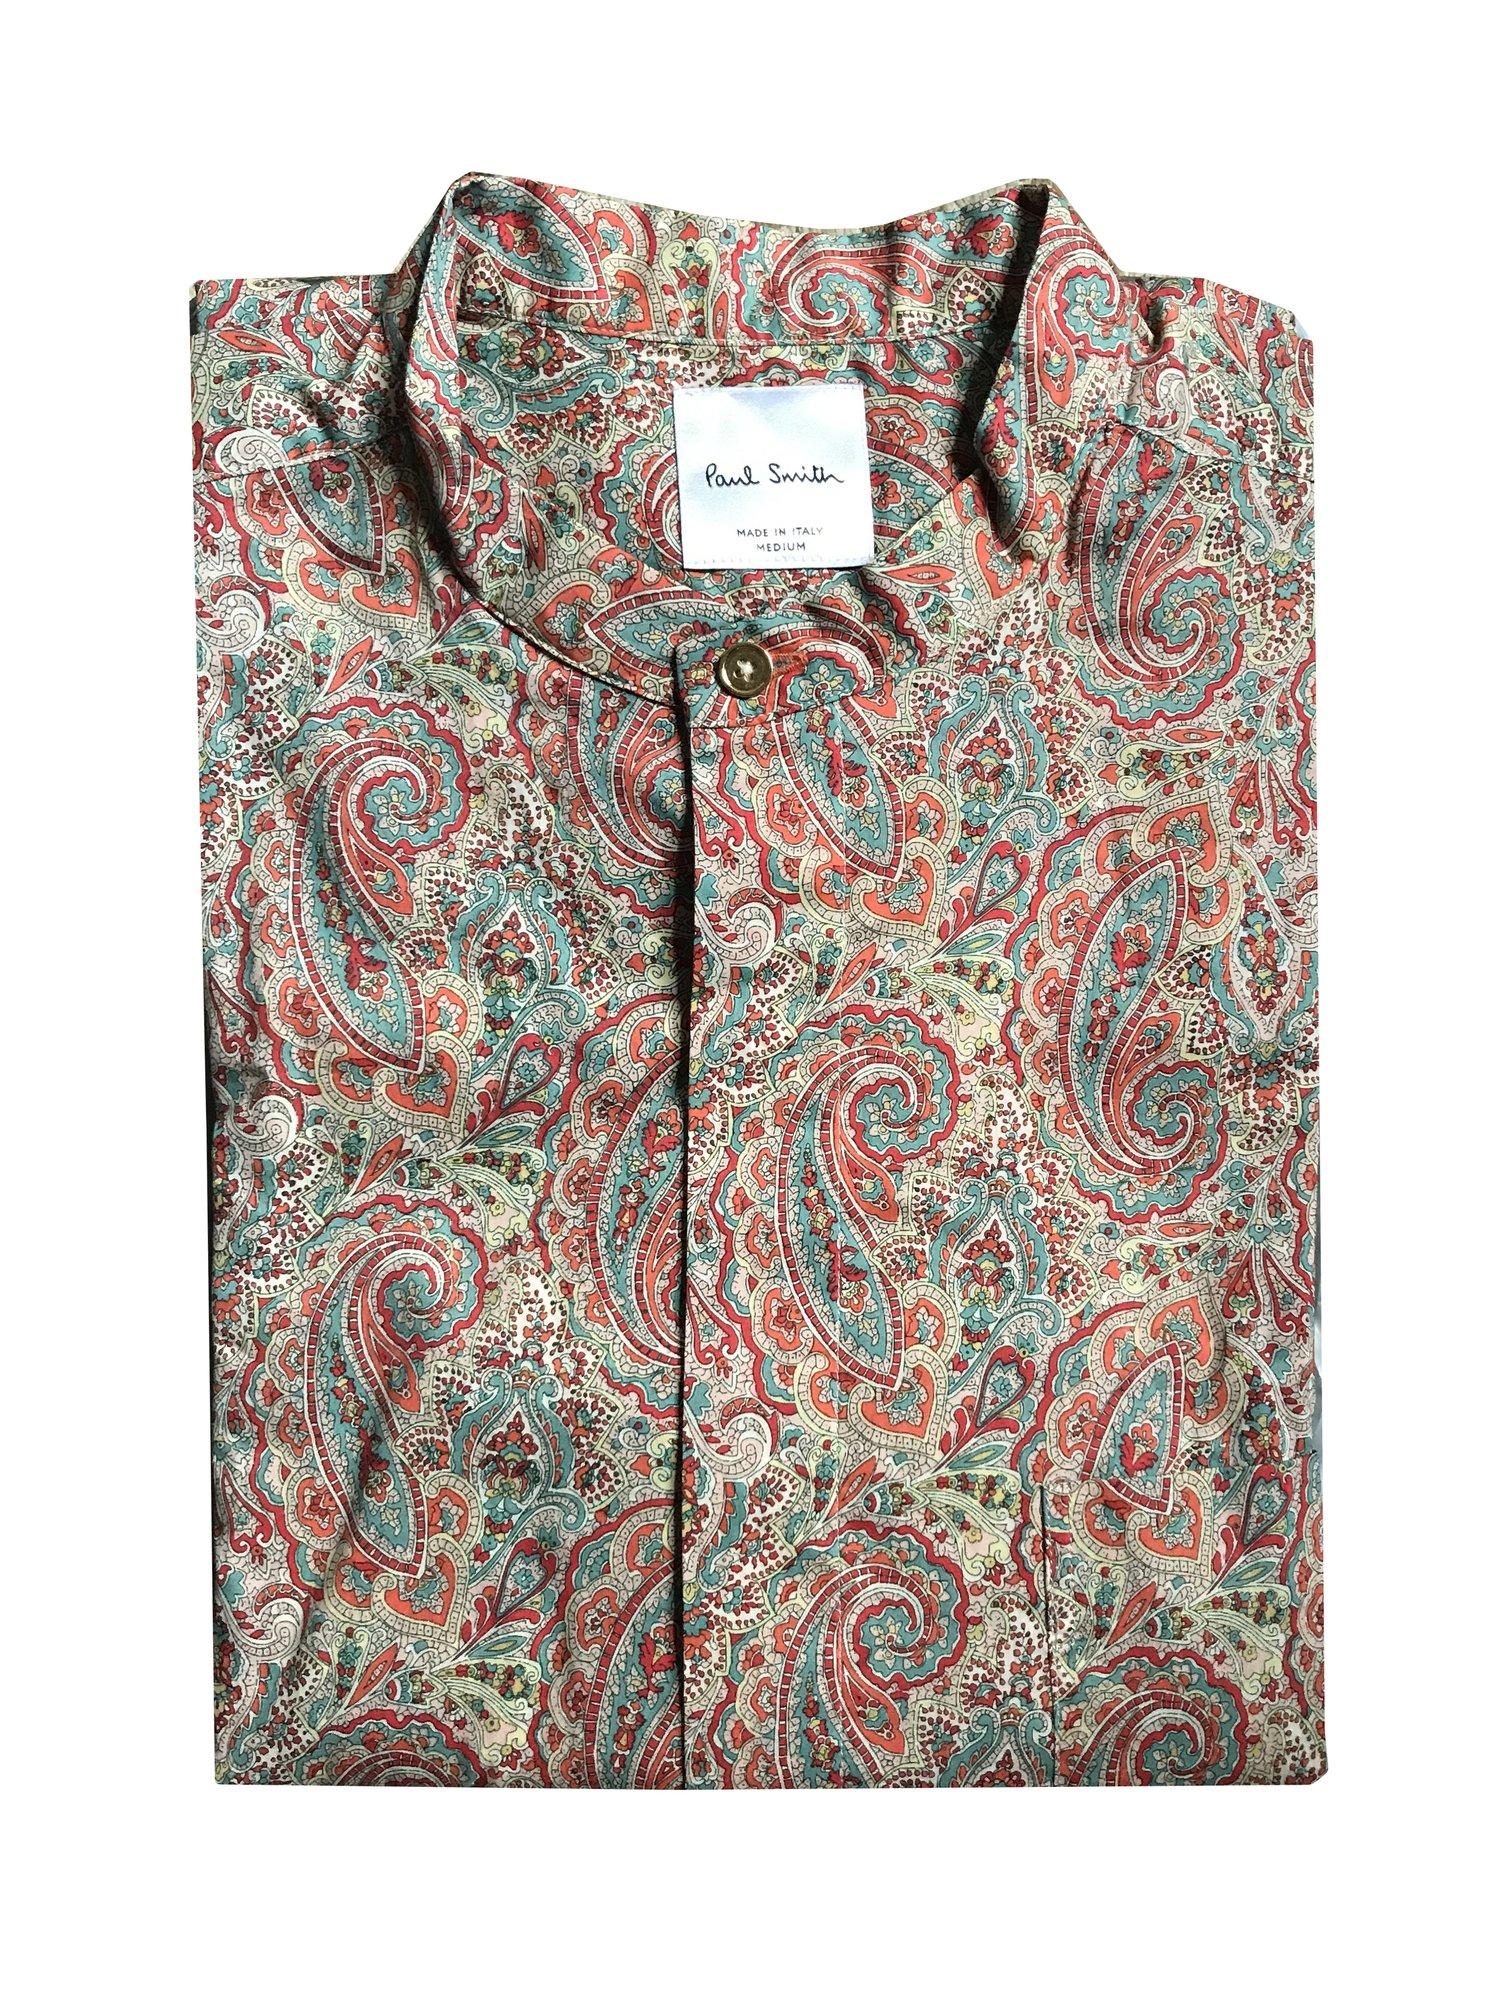 ps floral shirt.jpg